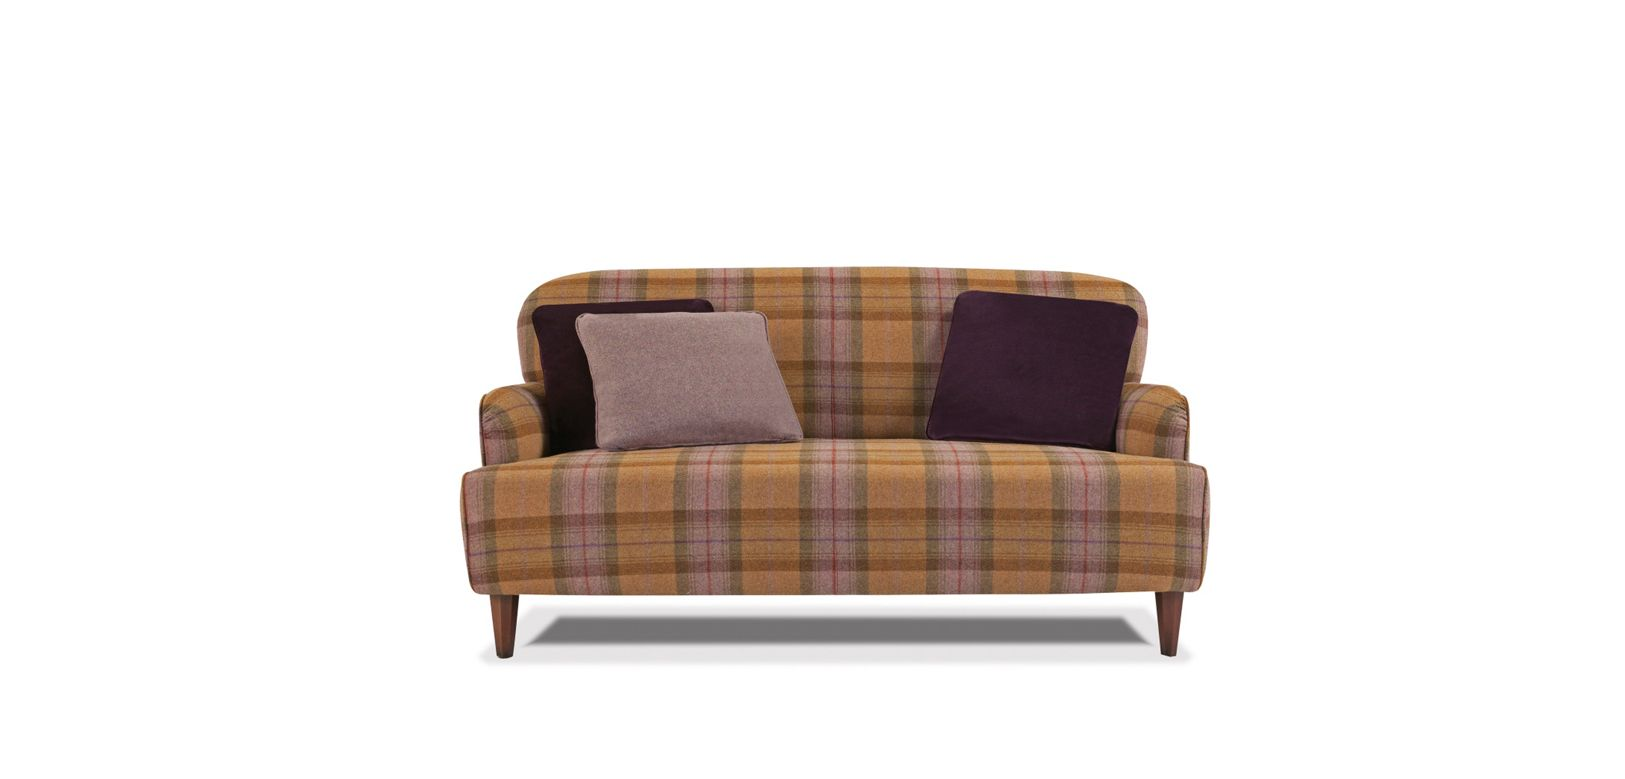 Cardamome 1 5 seat sofa nouveaux classiques collection for Sofa 1 80 breit